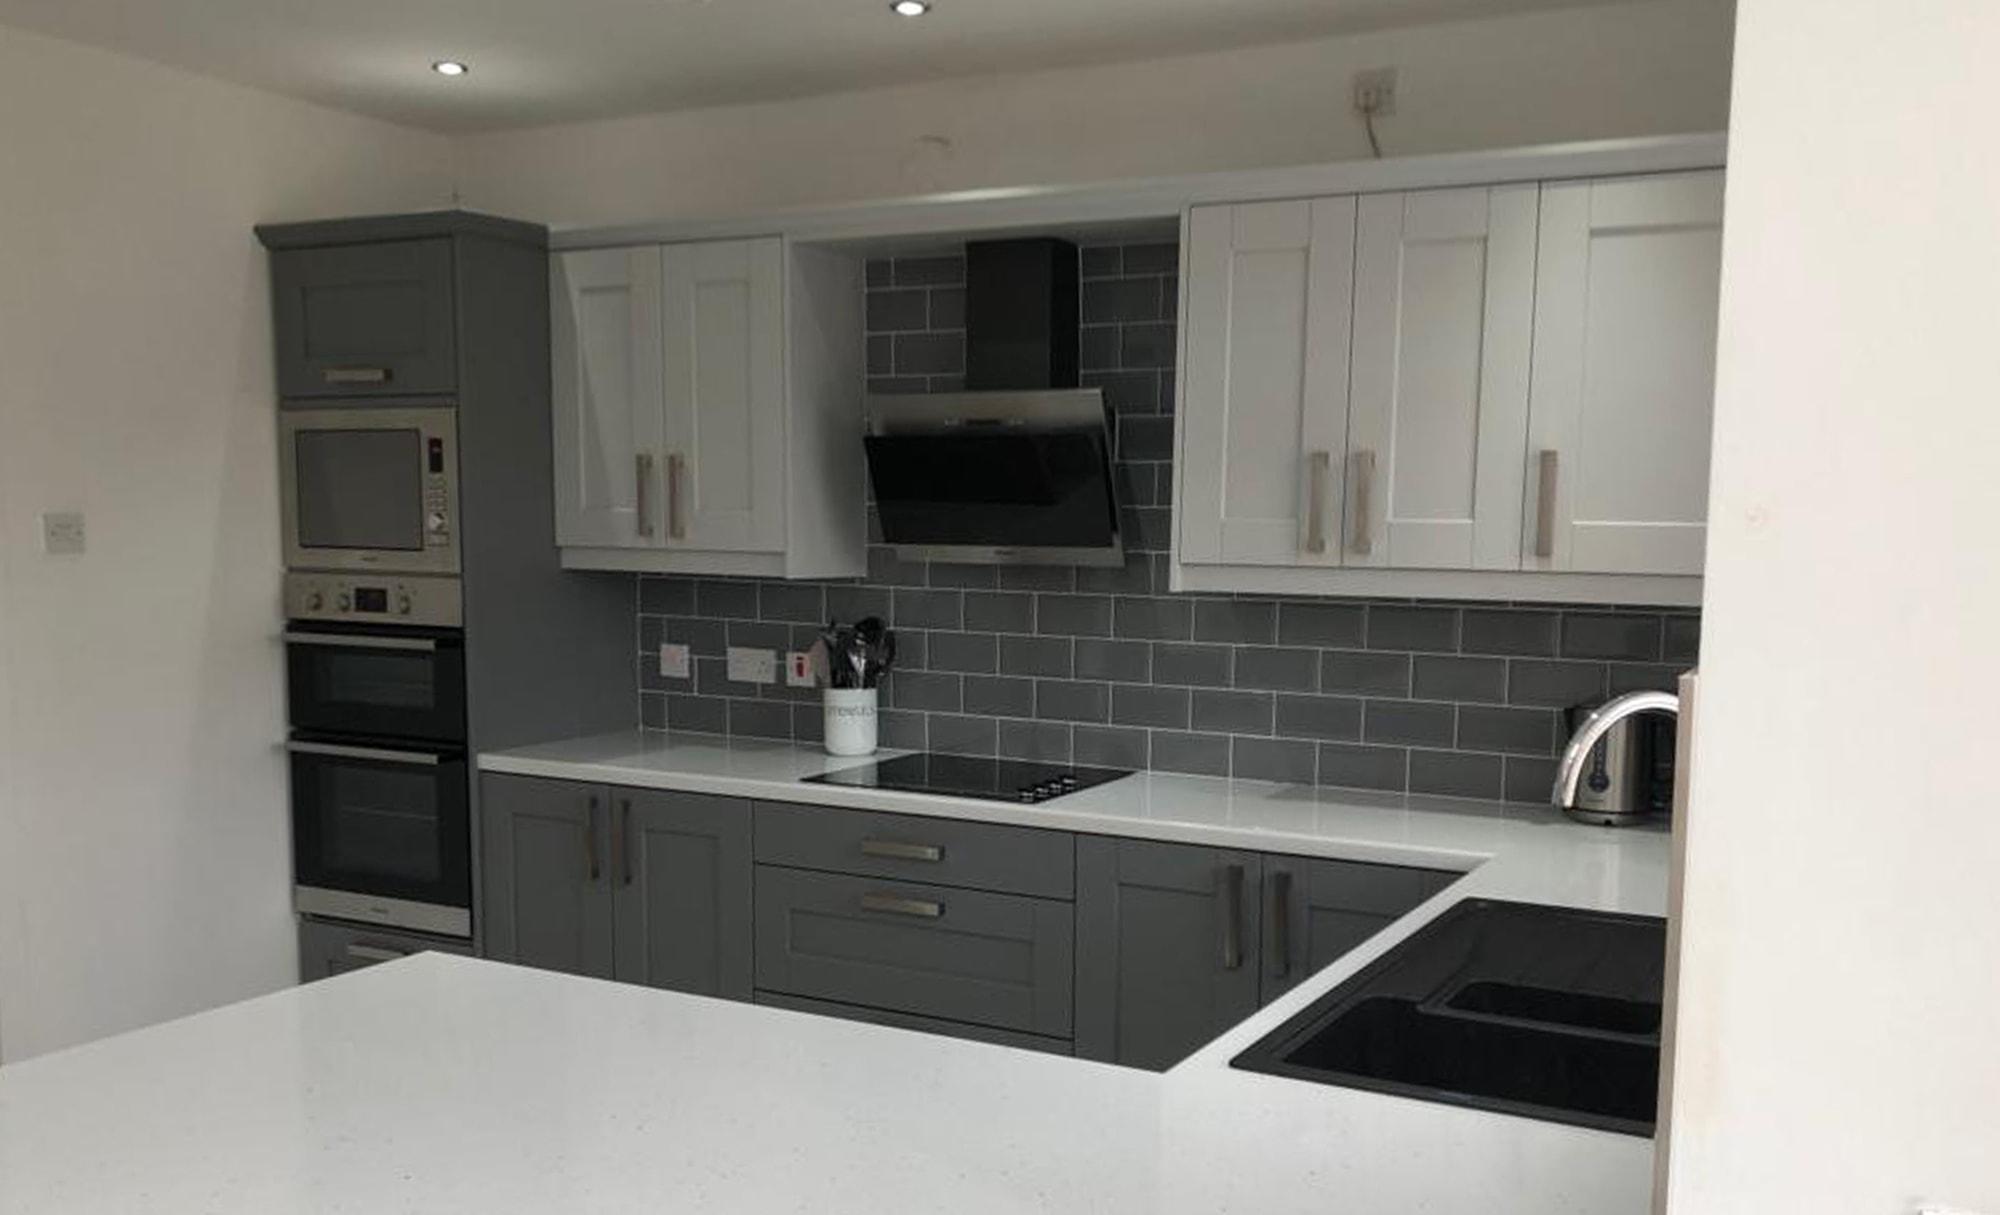 Make Kensington Light Grey & Dust Grey Kitchen Sink